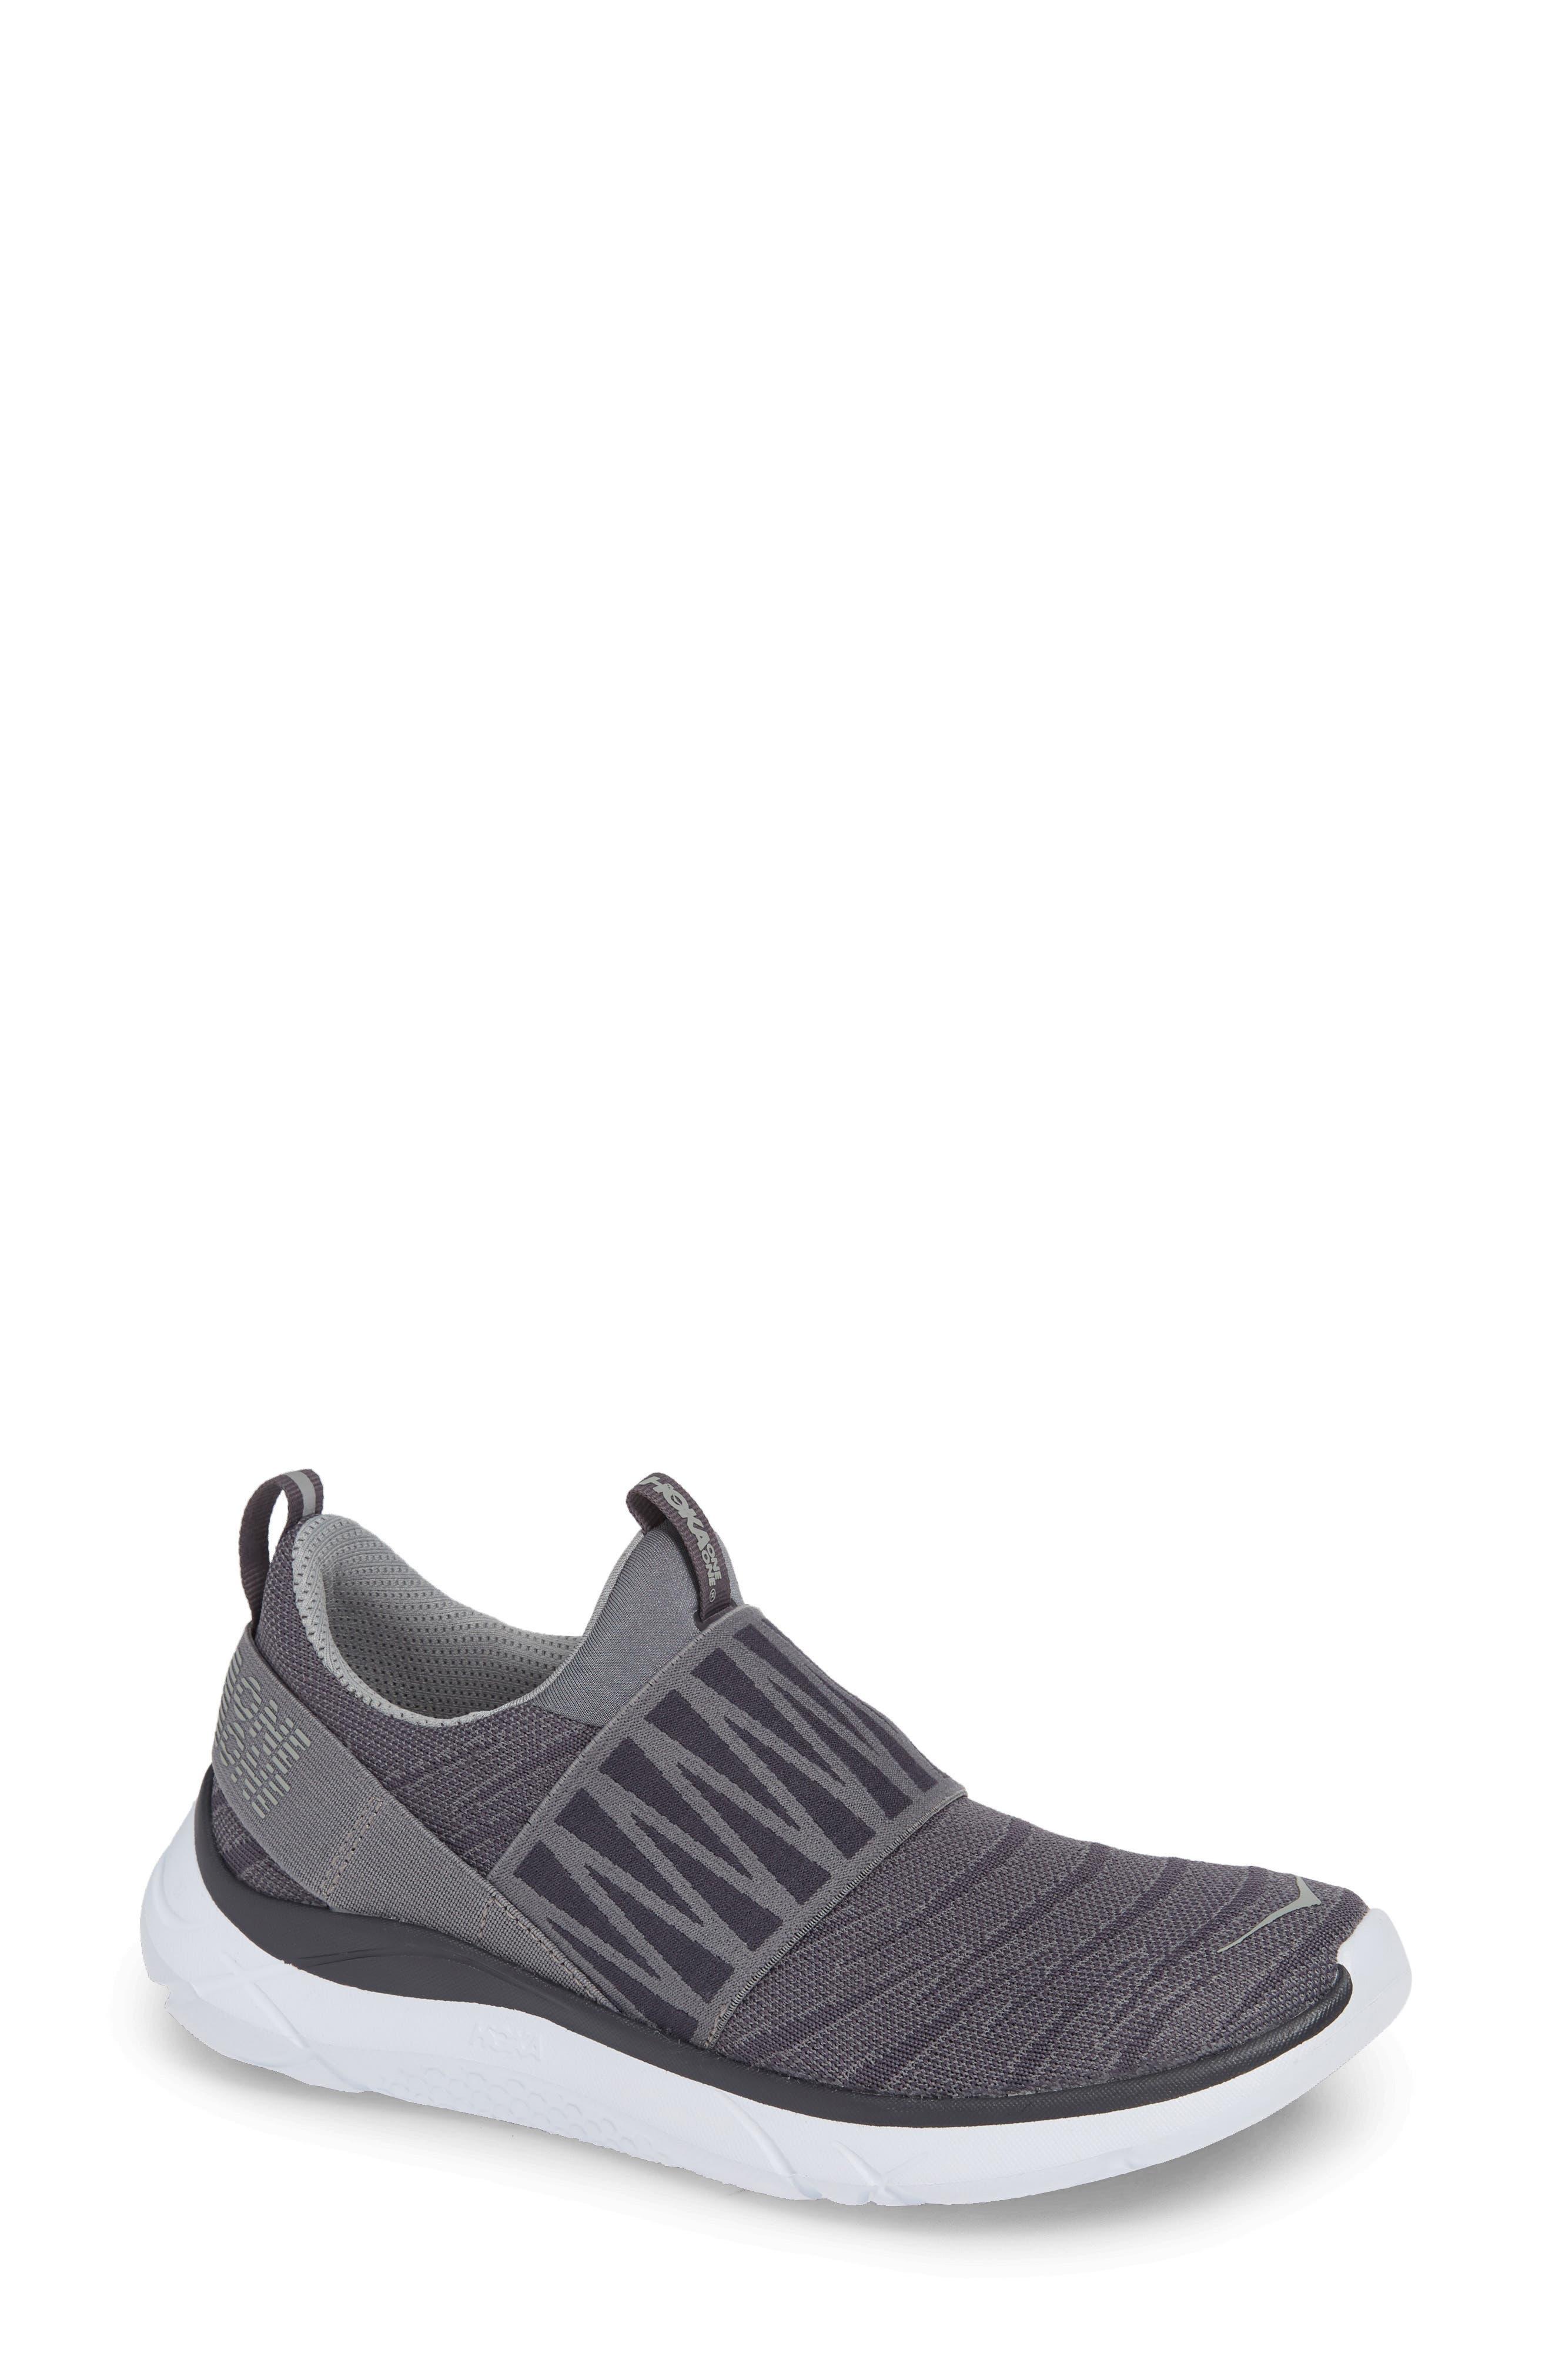 Hoka One One Hupana Knit Jacquard Slip-On Running Shoe- Grey